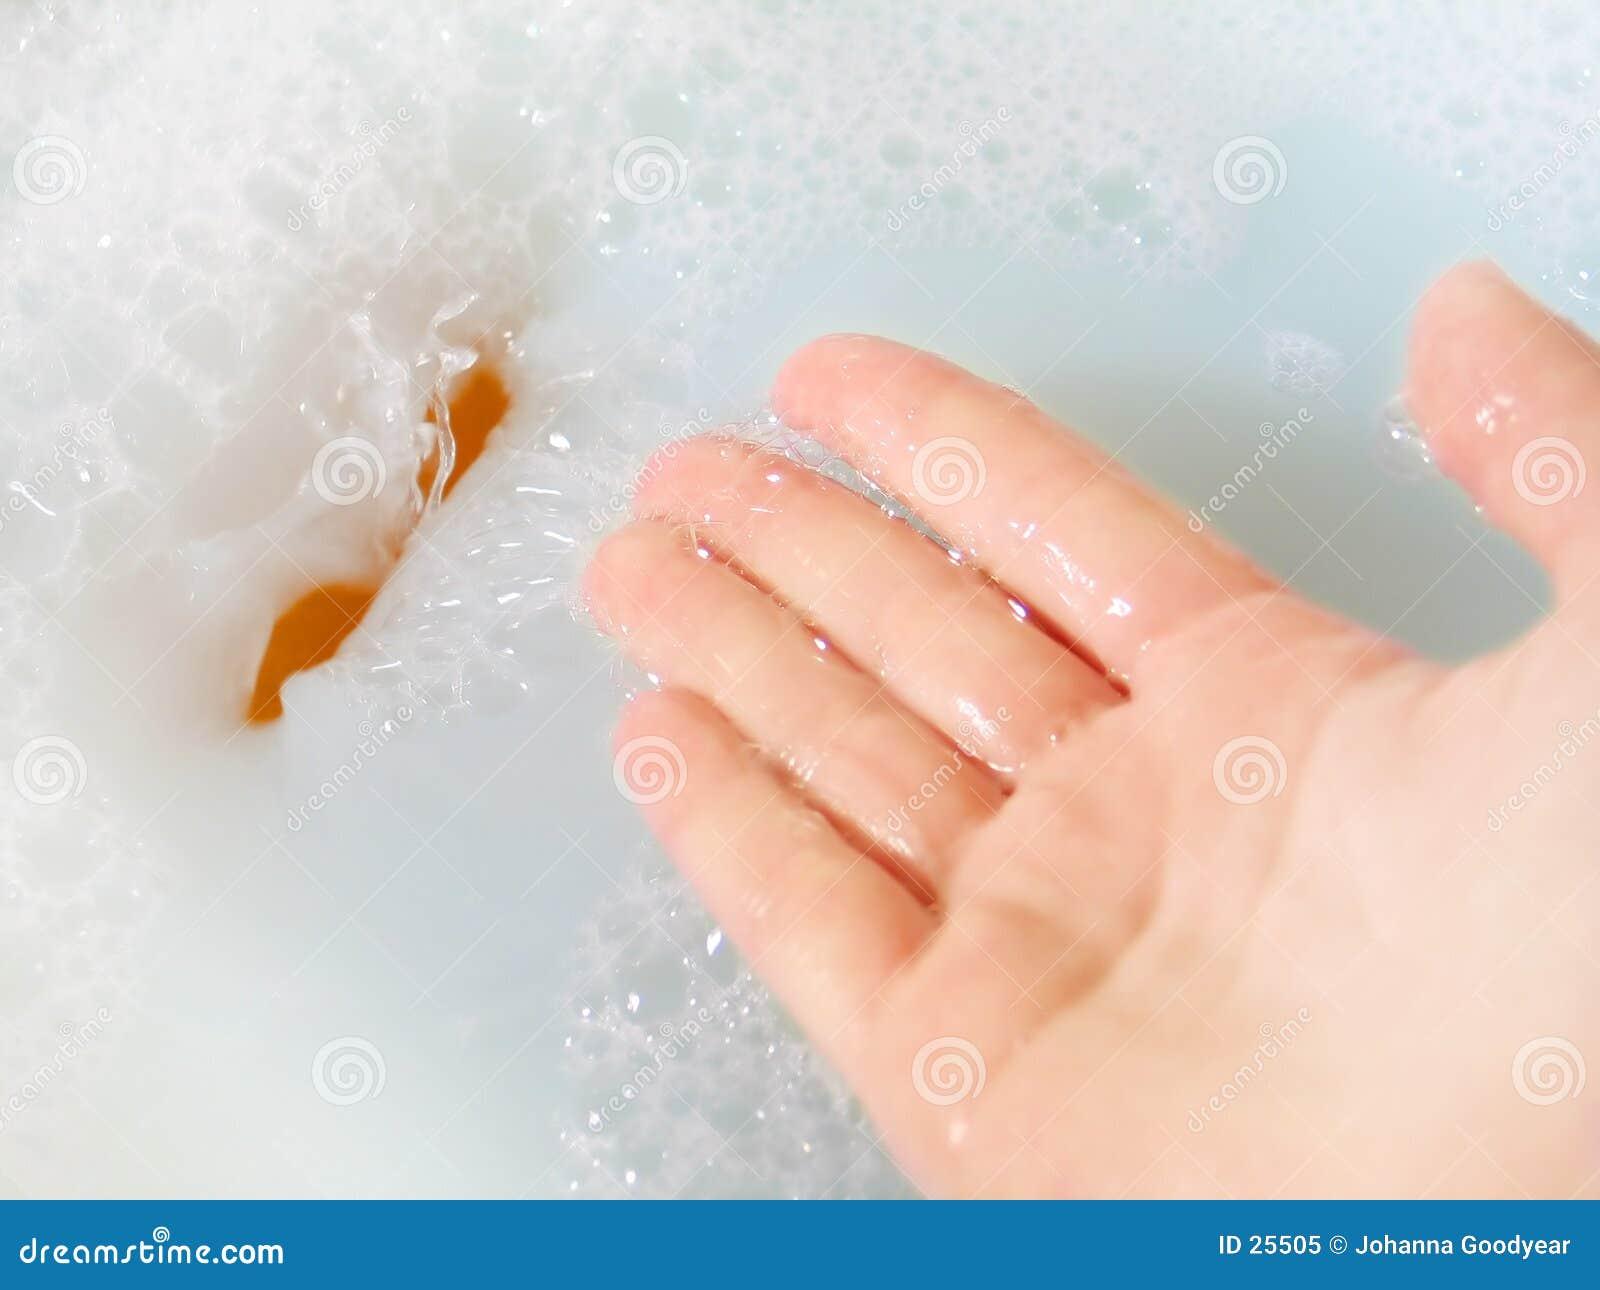 Soap series 6